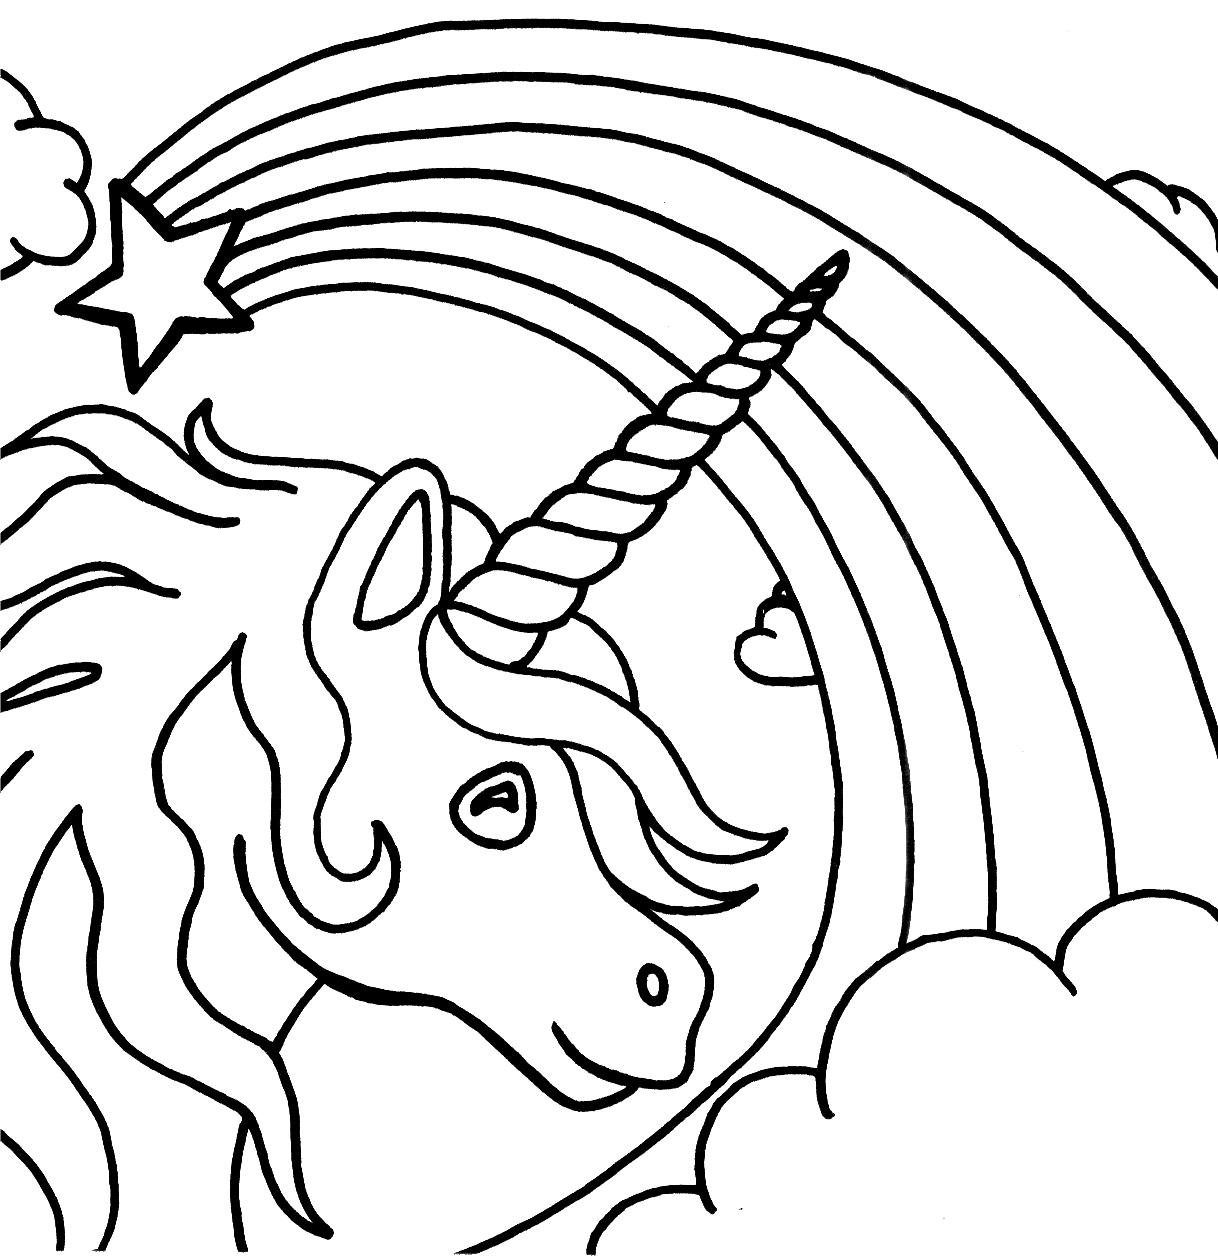 coloring page unicorn free printable unicorn coloring pages for kids page unicorn coloring